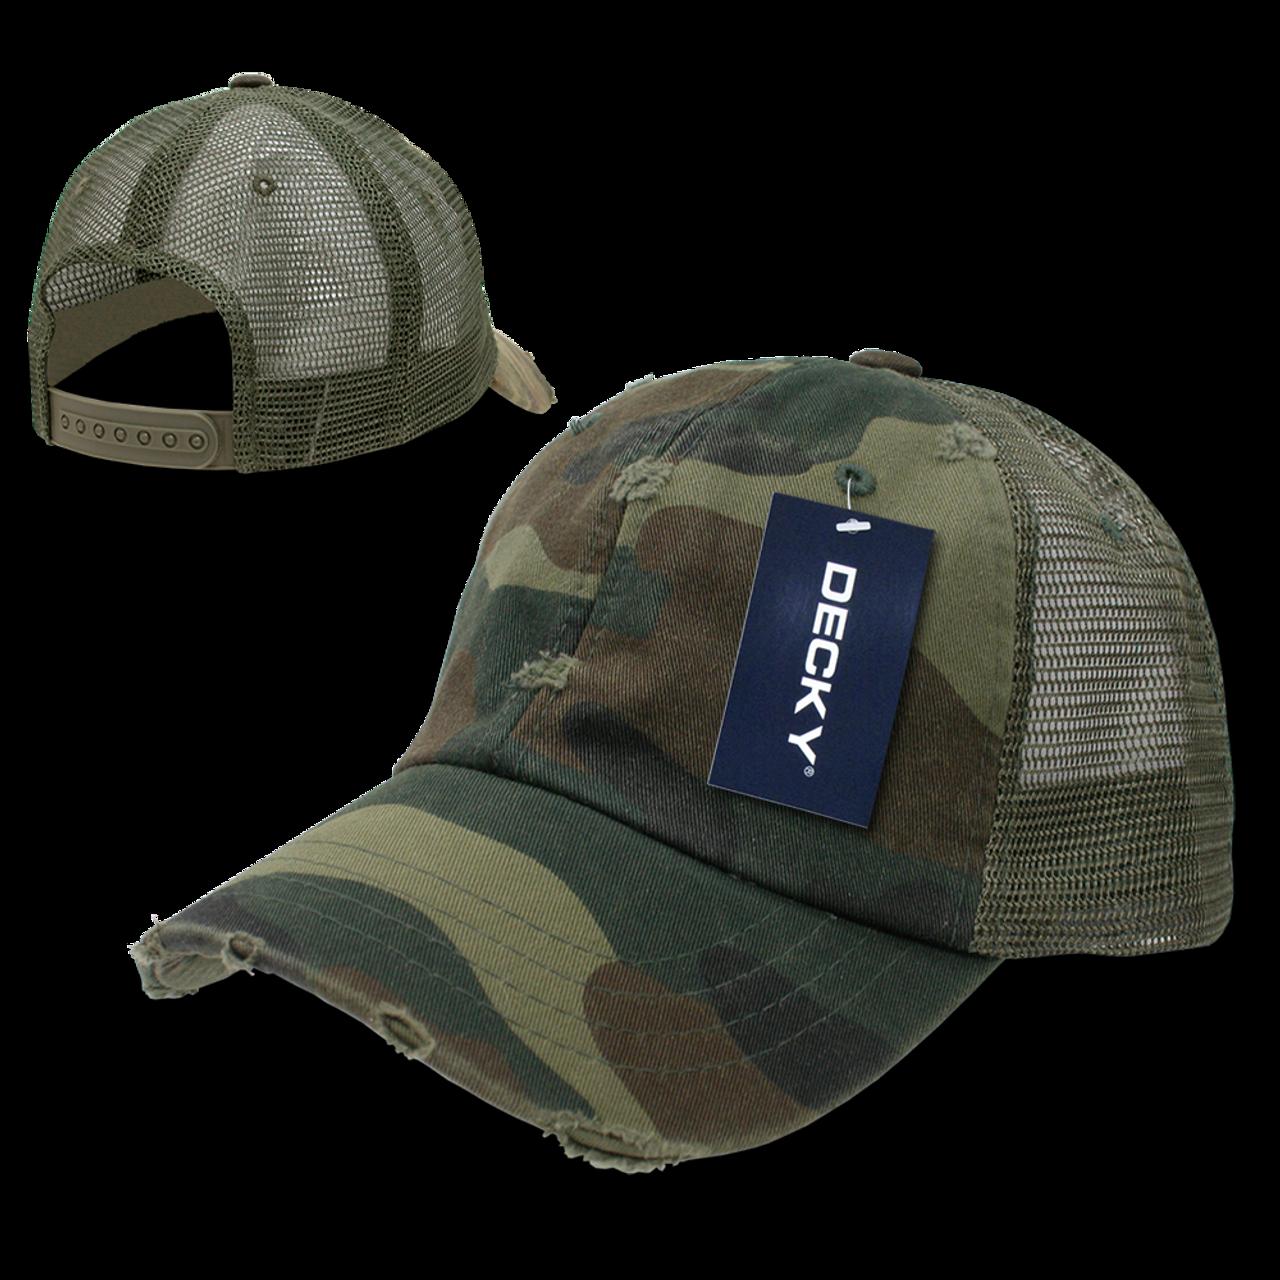 3623ac24fe6 Vintage Mesh Cap - Woodland Camouflage - U.S. Military Hats.com